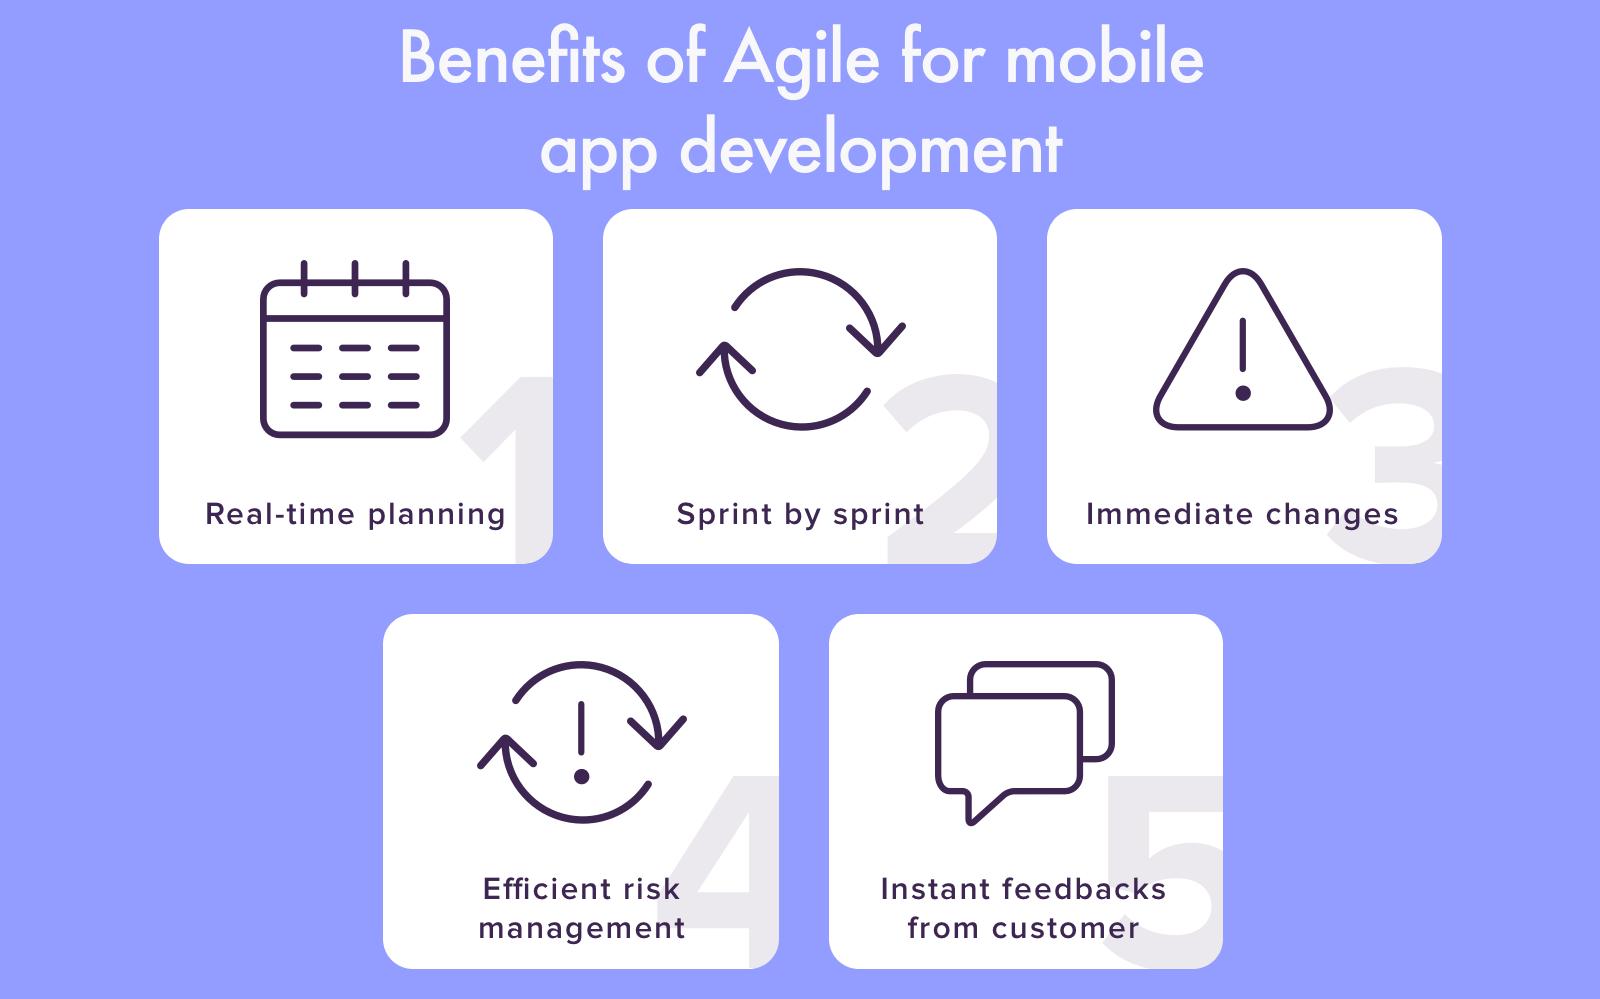 Benefits of Agile for mobile app development